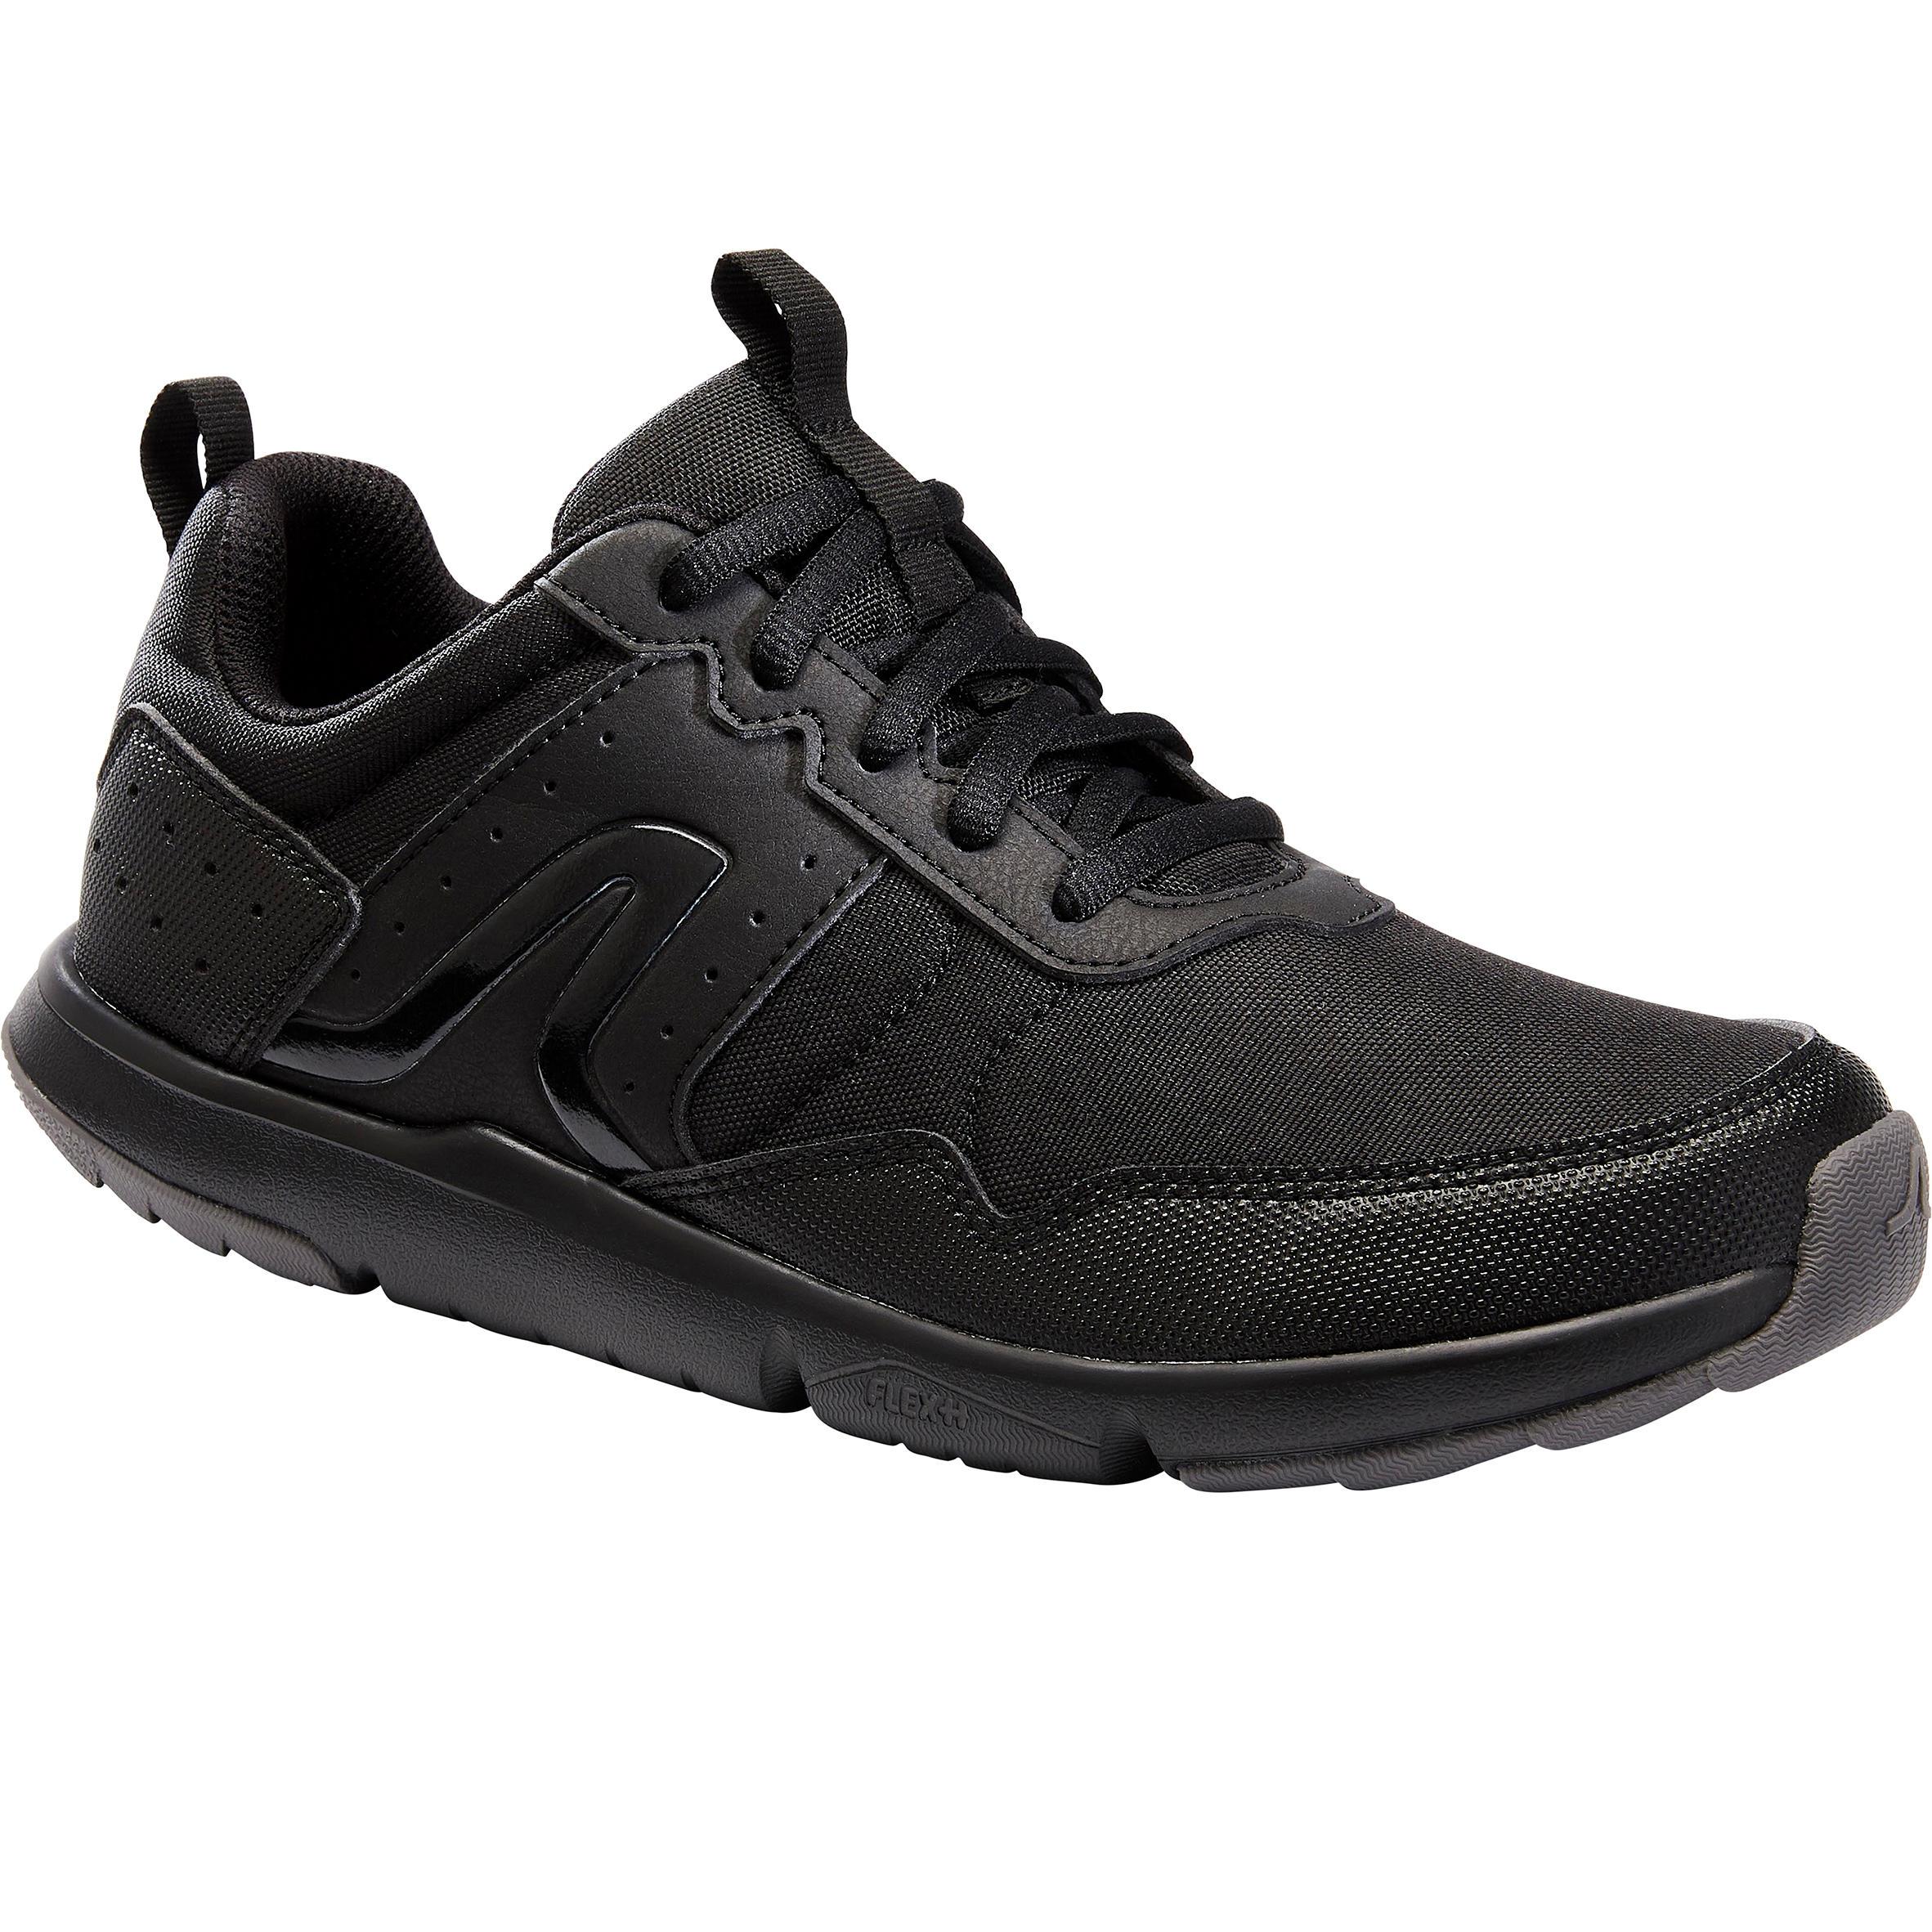 Newfeel Chaussures marche sportive femme Fitwalk Resist noir - Newfeel